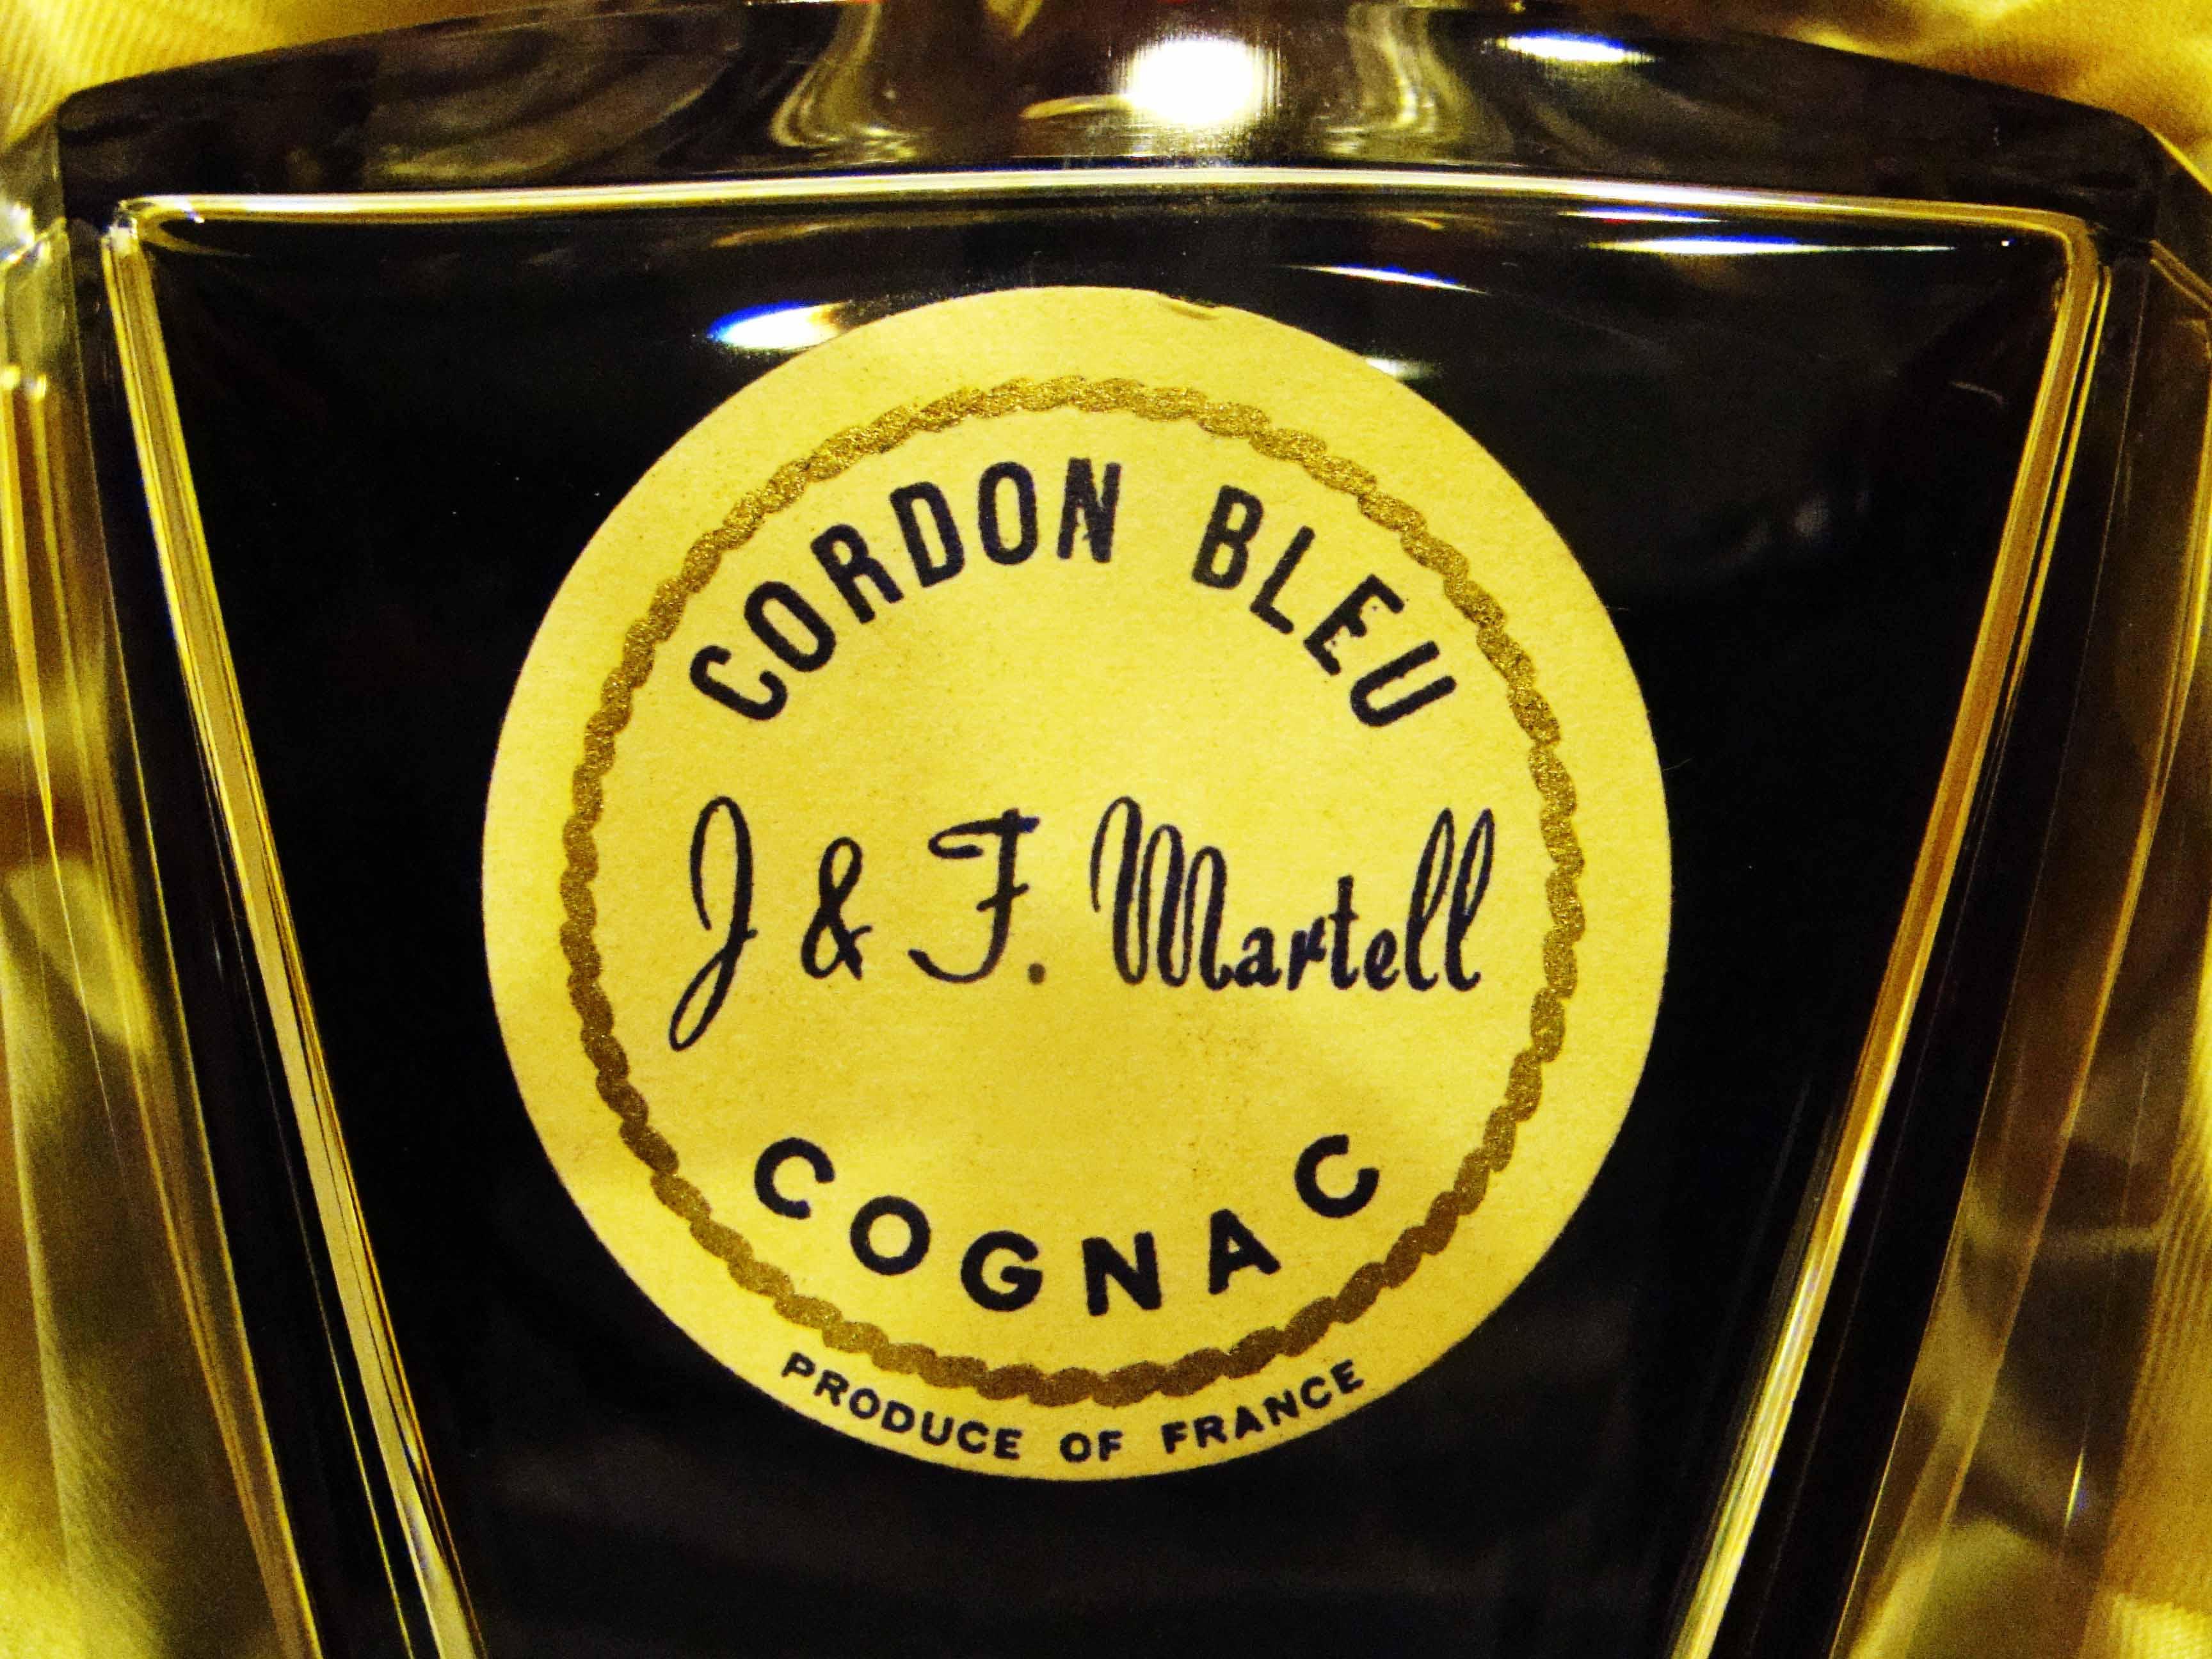 Cordon Bleu J & F Martell Baccarat Label